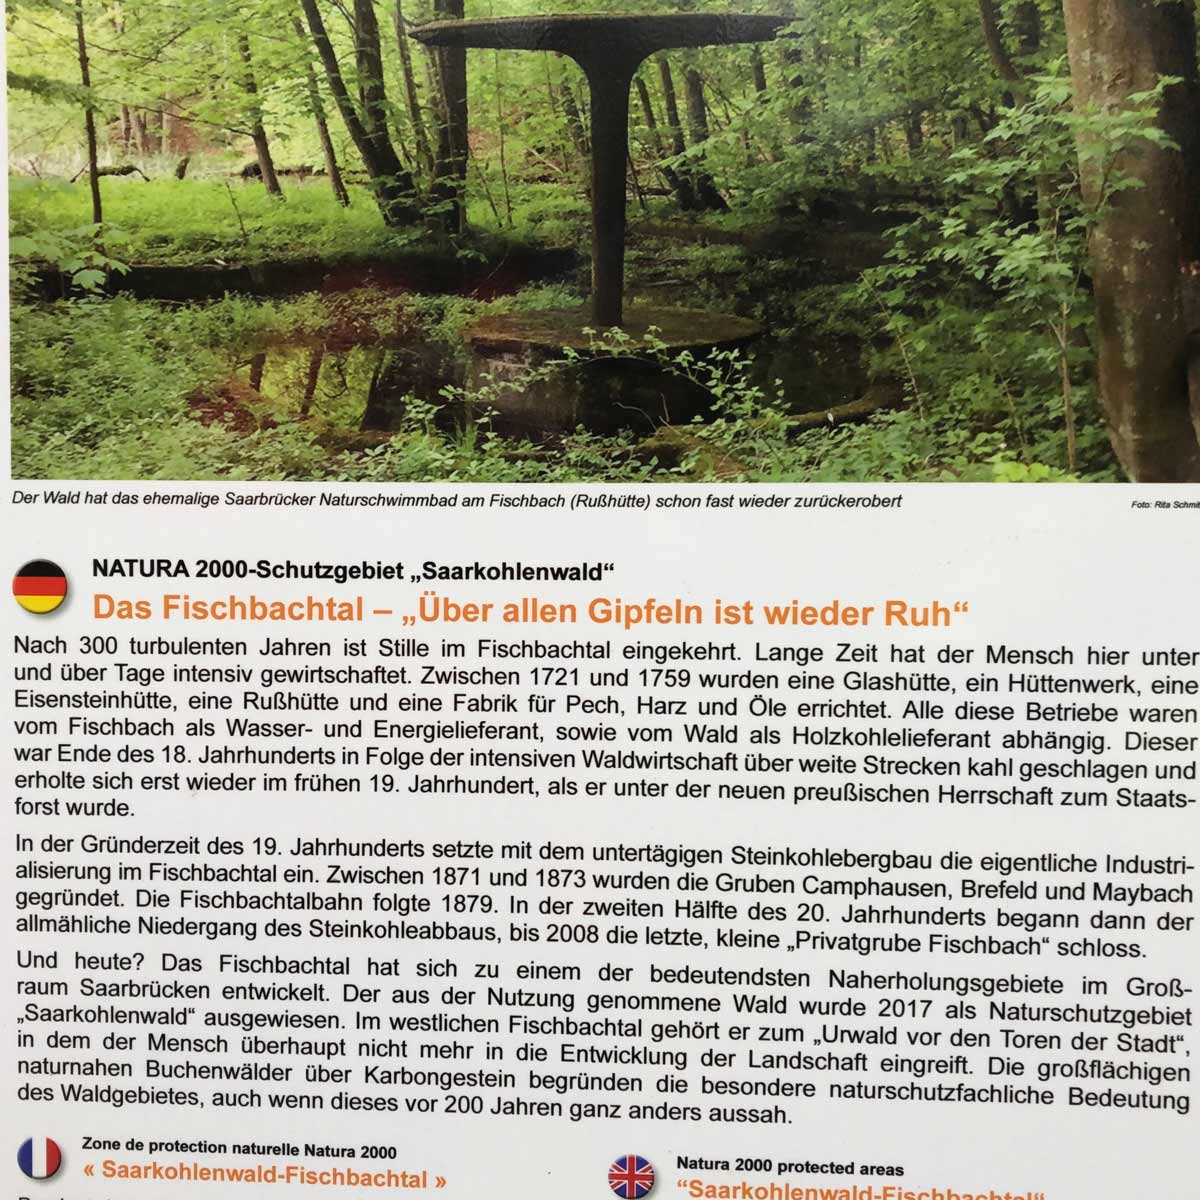 Pilzsuche, ehemaliges Naturbad Saarbücken